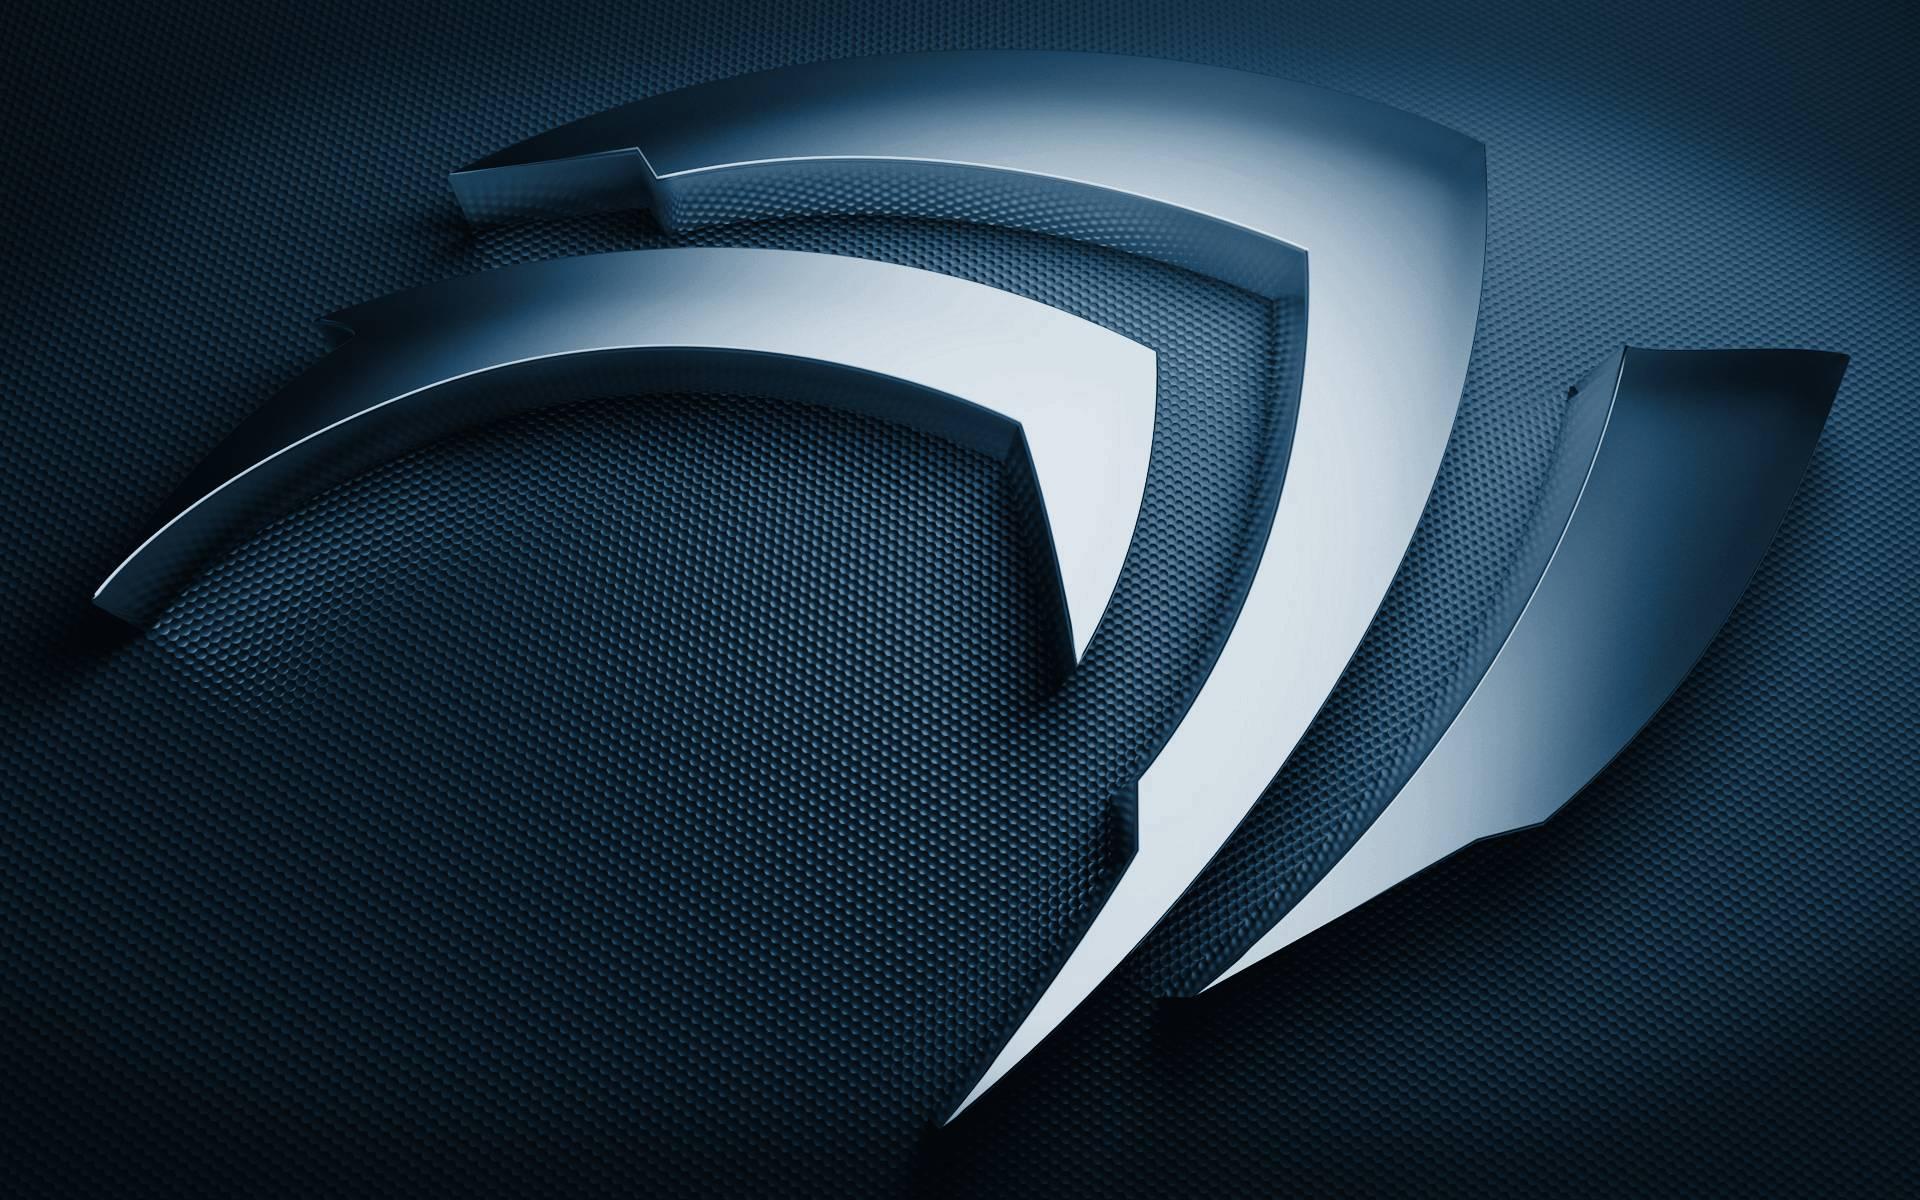 nvidia intel gigabyte wallpaper - photo #12